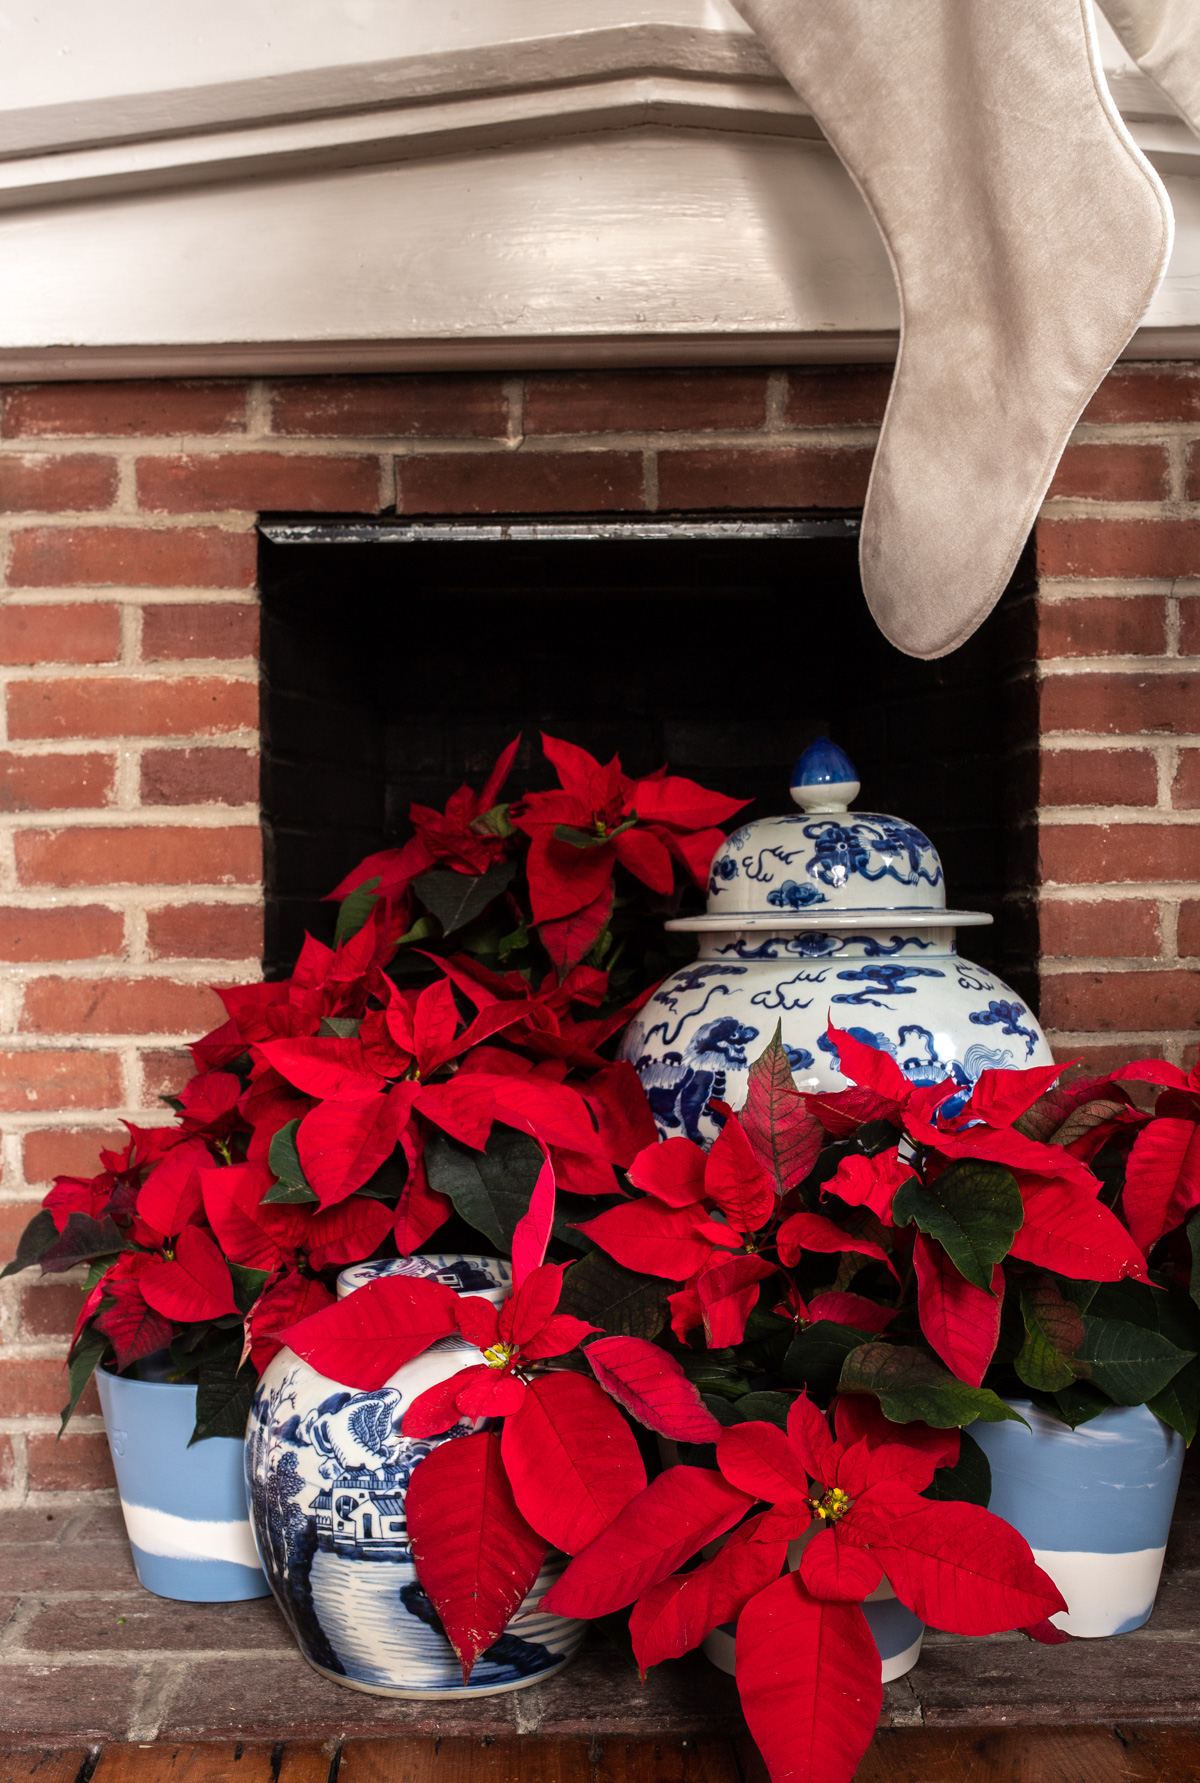 Stacie Flinner x New England Holiday Decorations-15.jpg